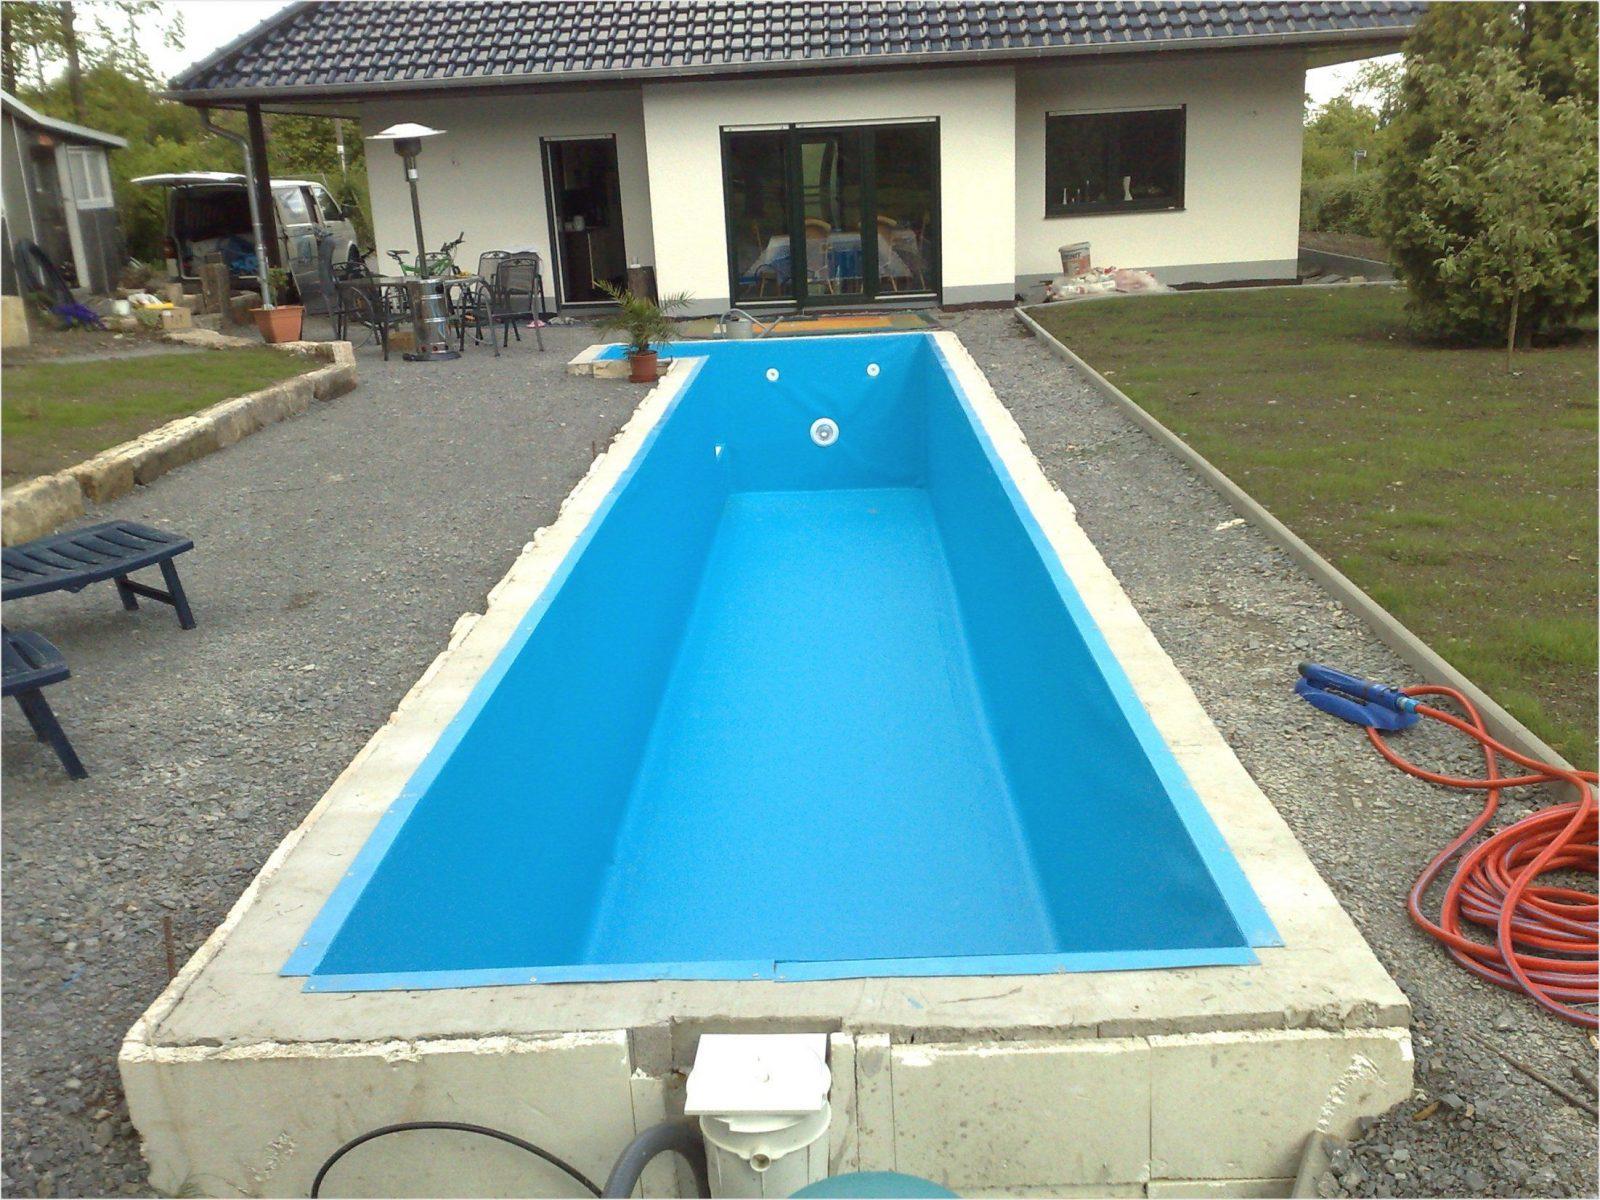 Pool selber bauen billig haus design ideen for Billig bauen